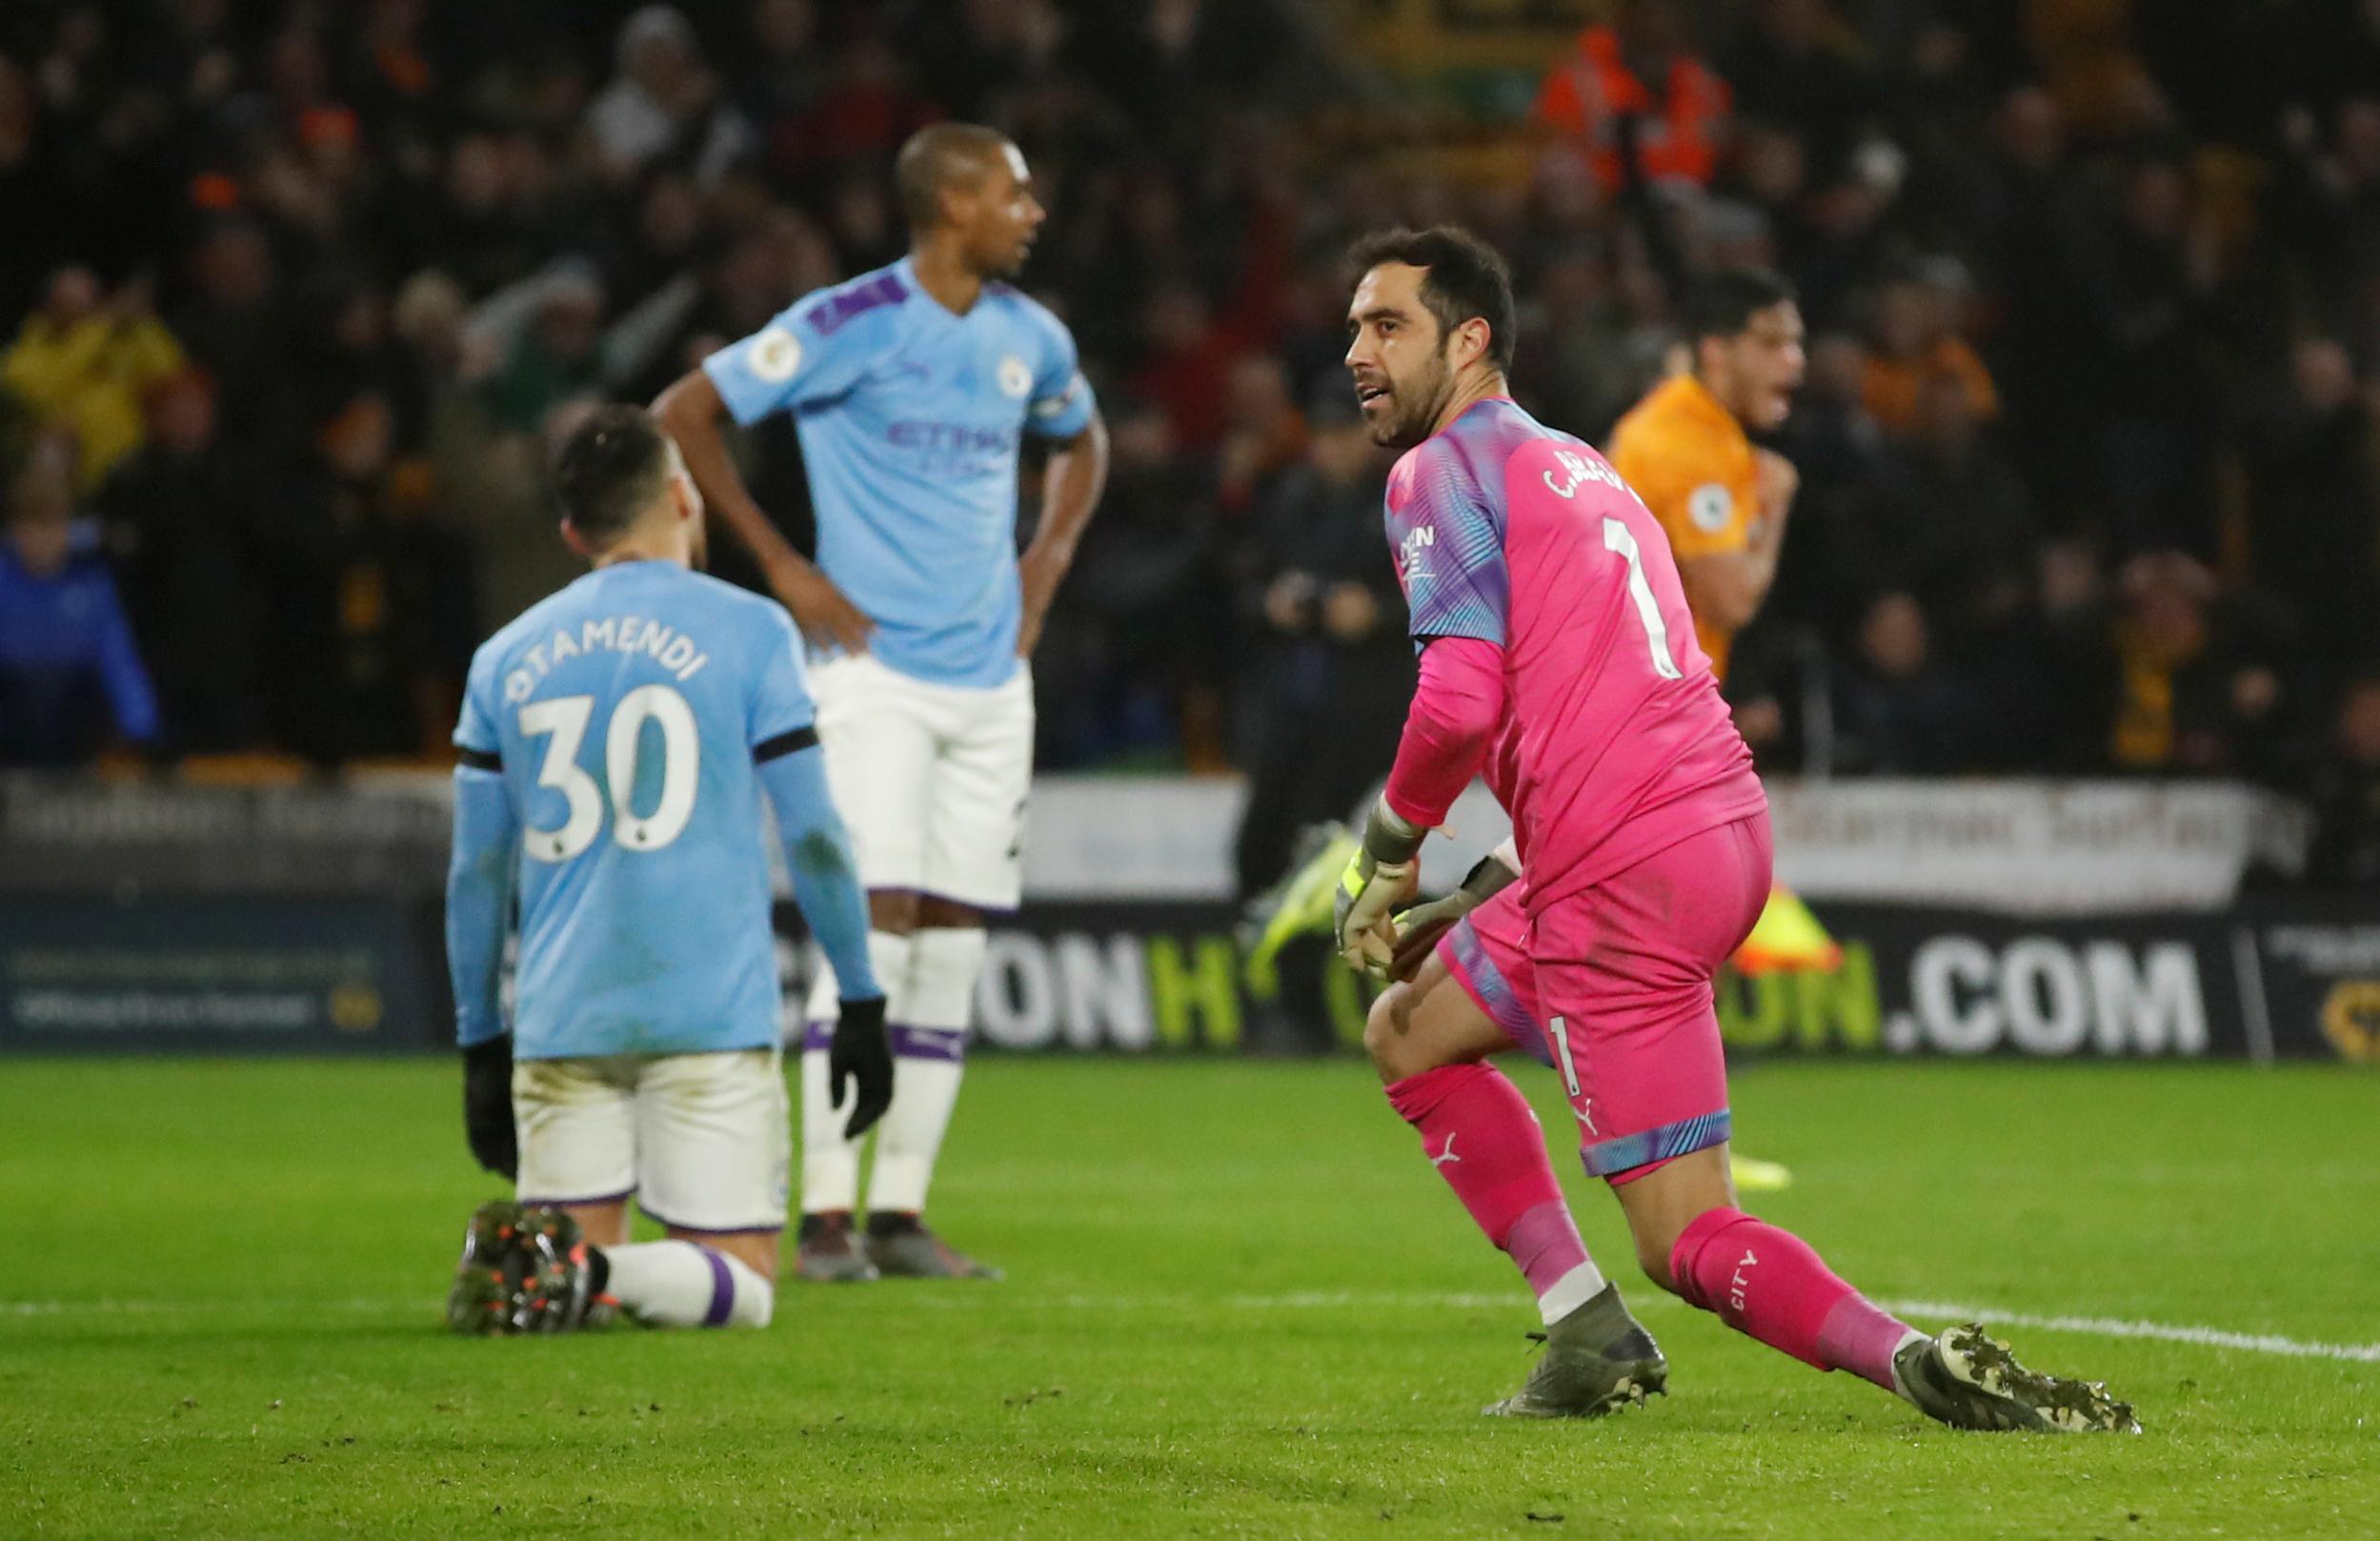 Football - Etranger - Un Manchester City sans défense